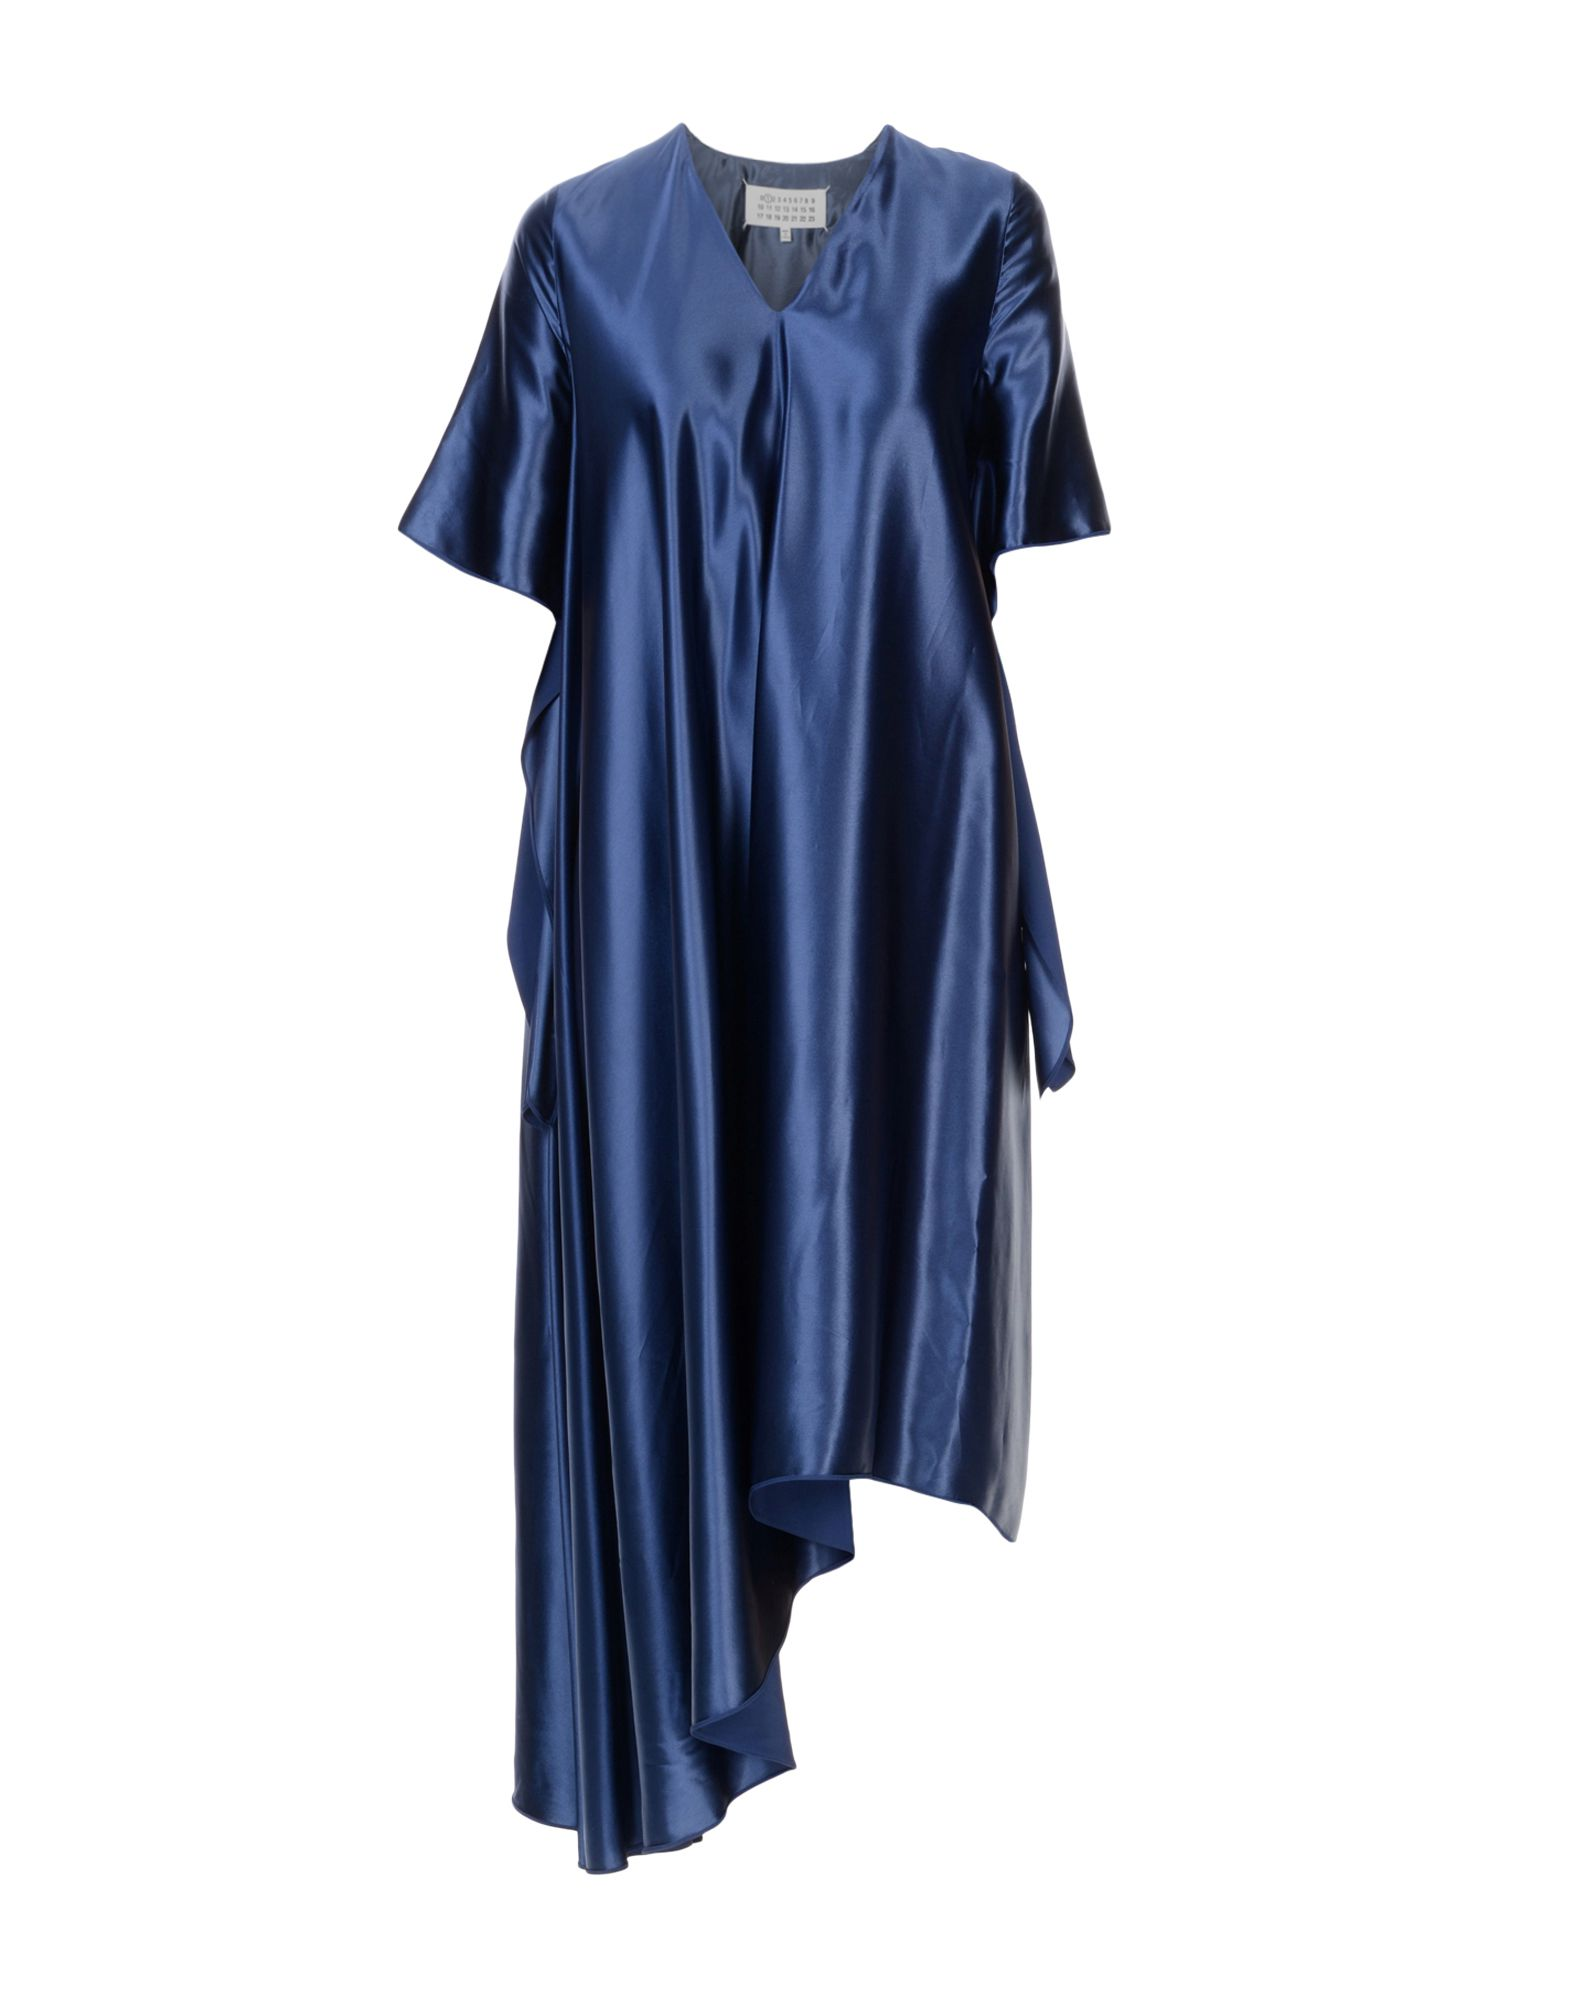 MAISON MARGIELA | MAISON MARGIELA Knee-Length Dresses 34849617 | Goxip